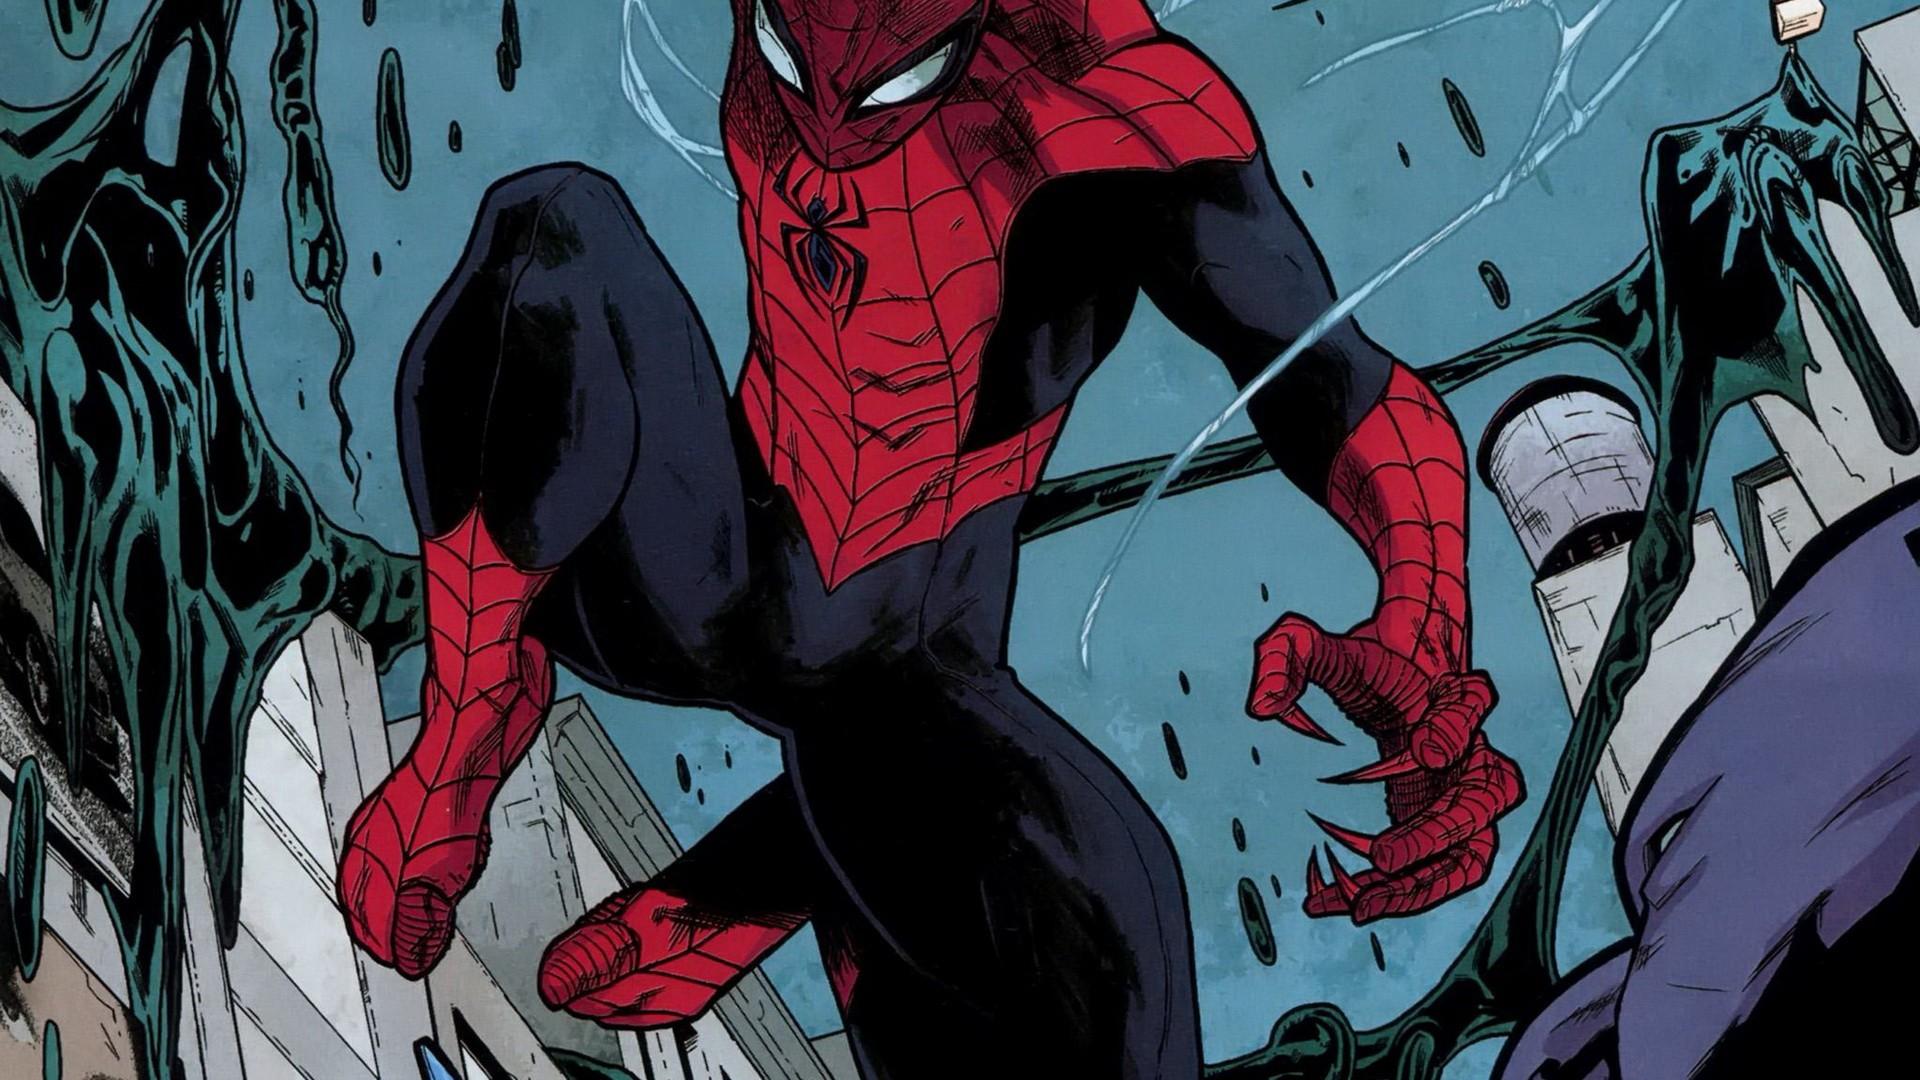 Free Download Spider Man Computer Wallpapers Desktop Backgrounds